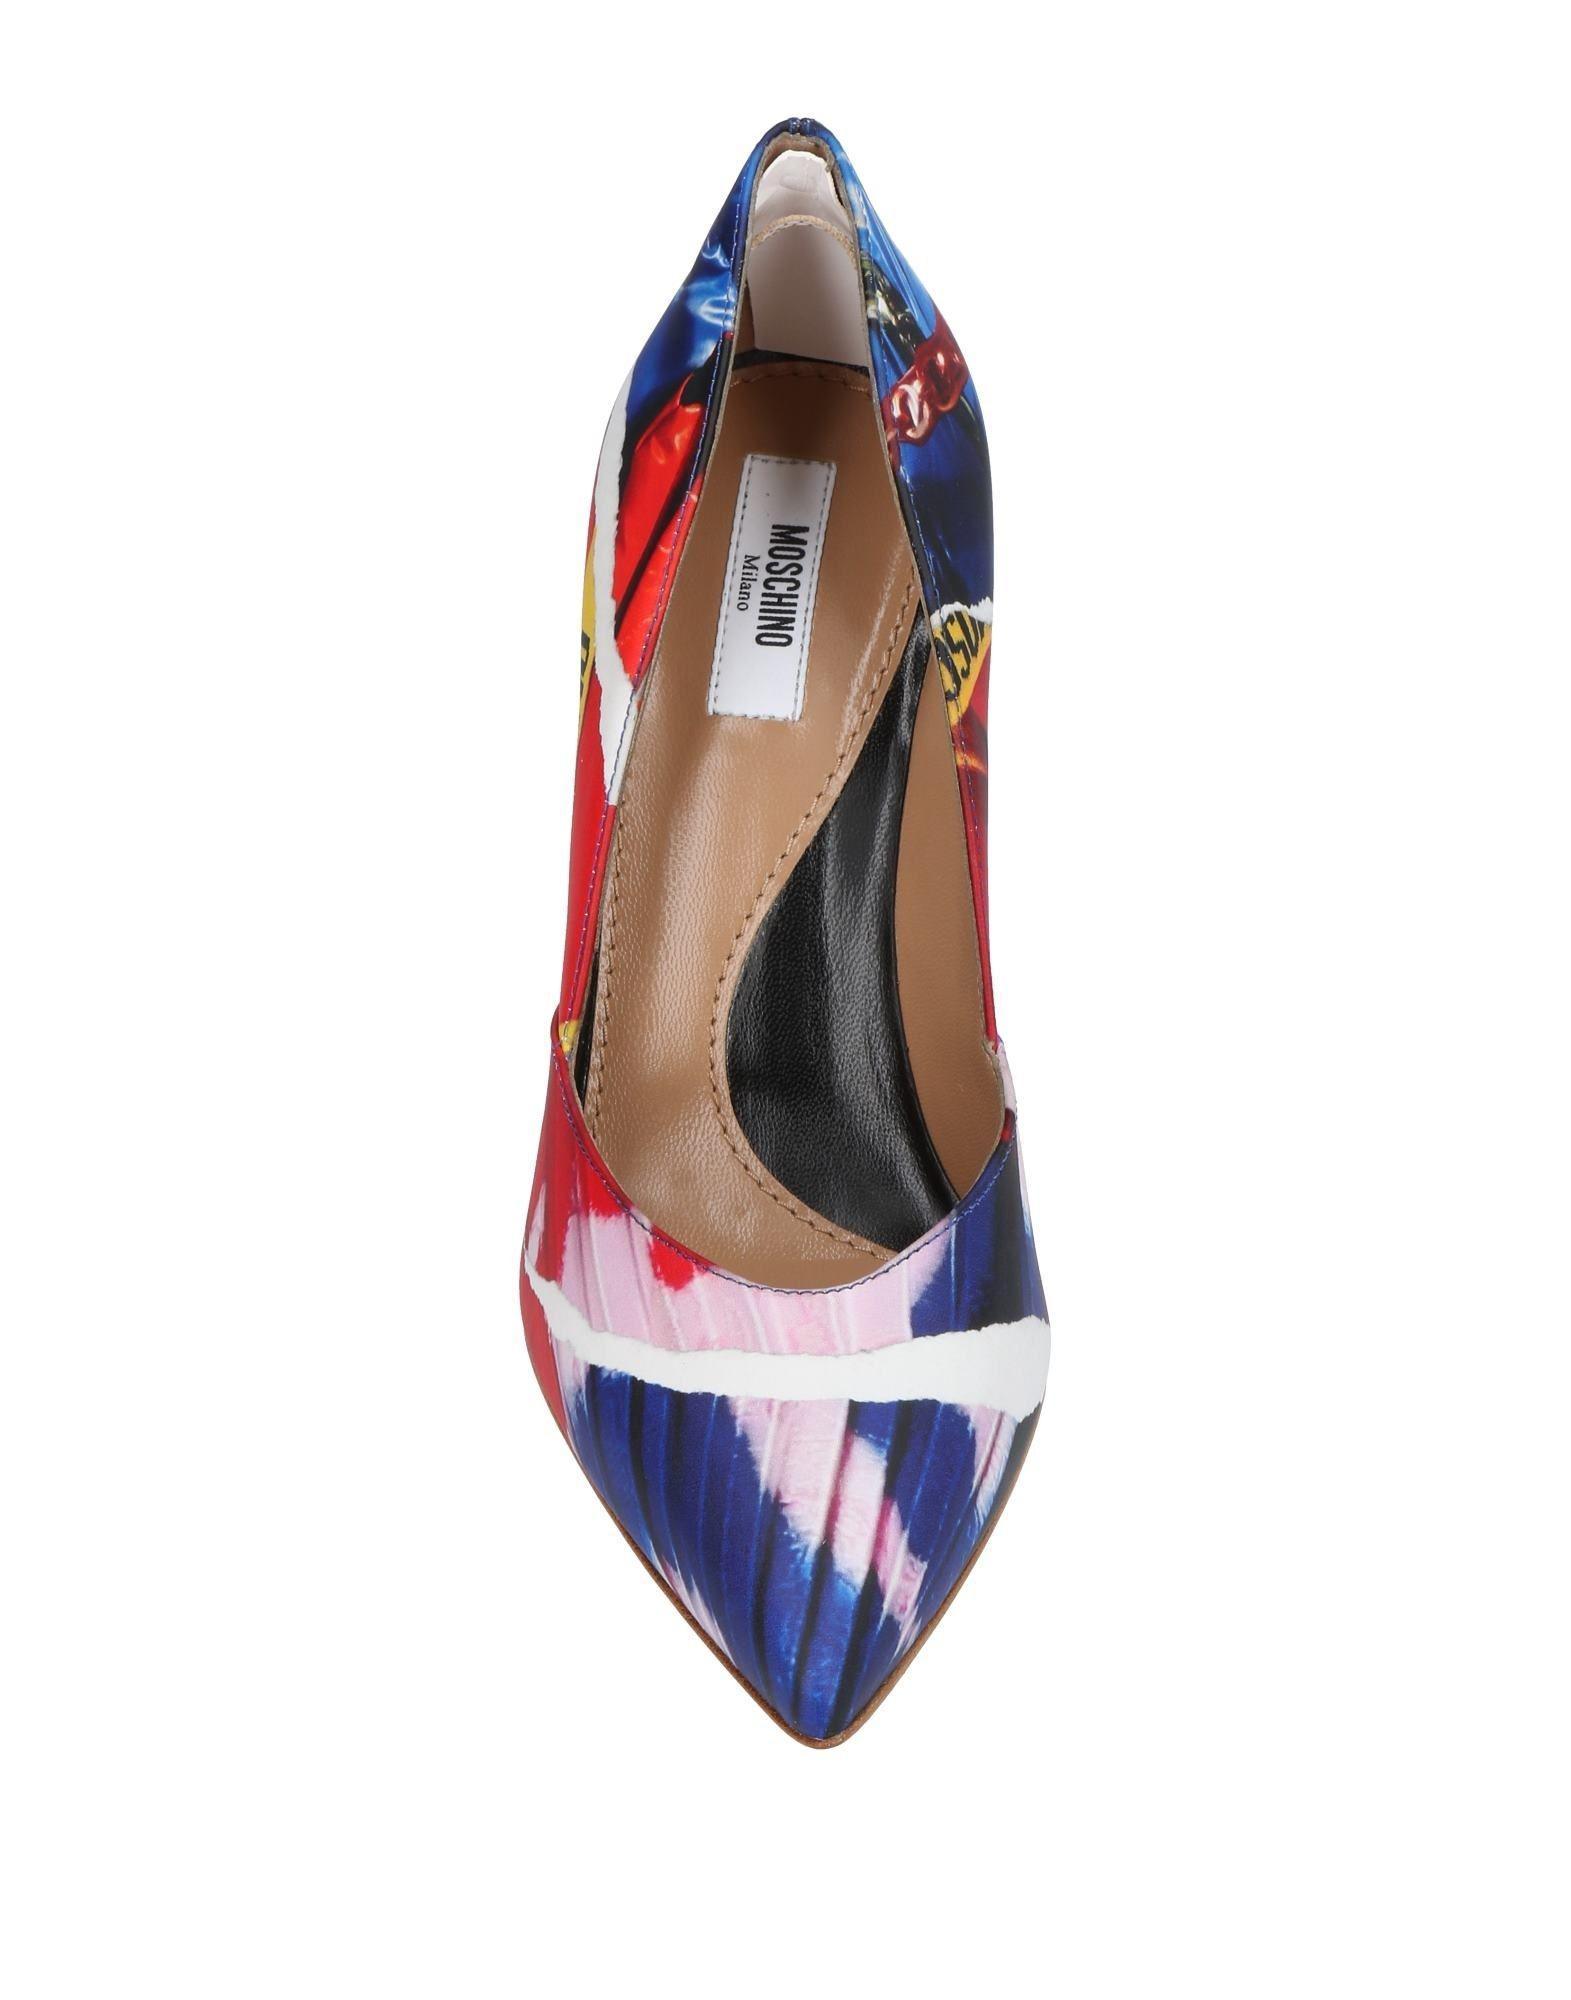 Zapatos de salón Moschino de Cuero de color Azul